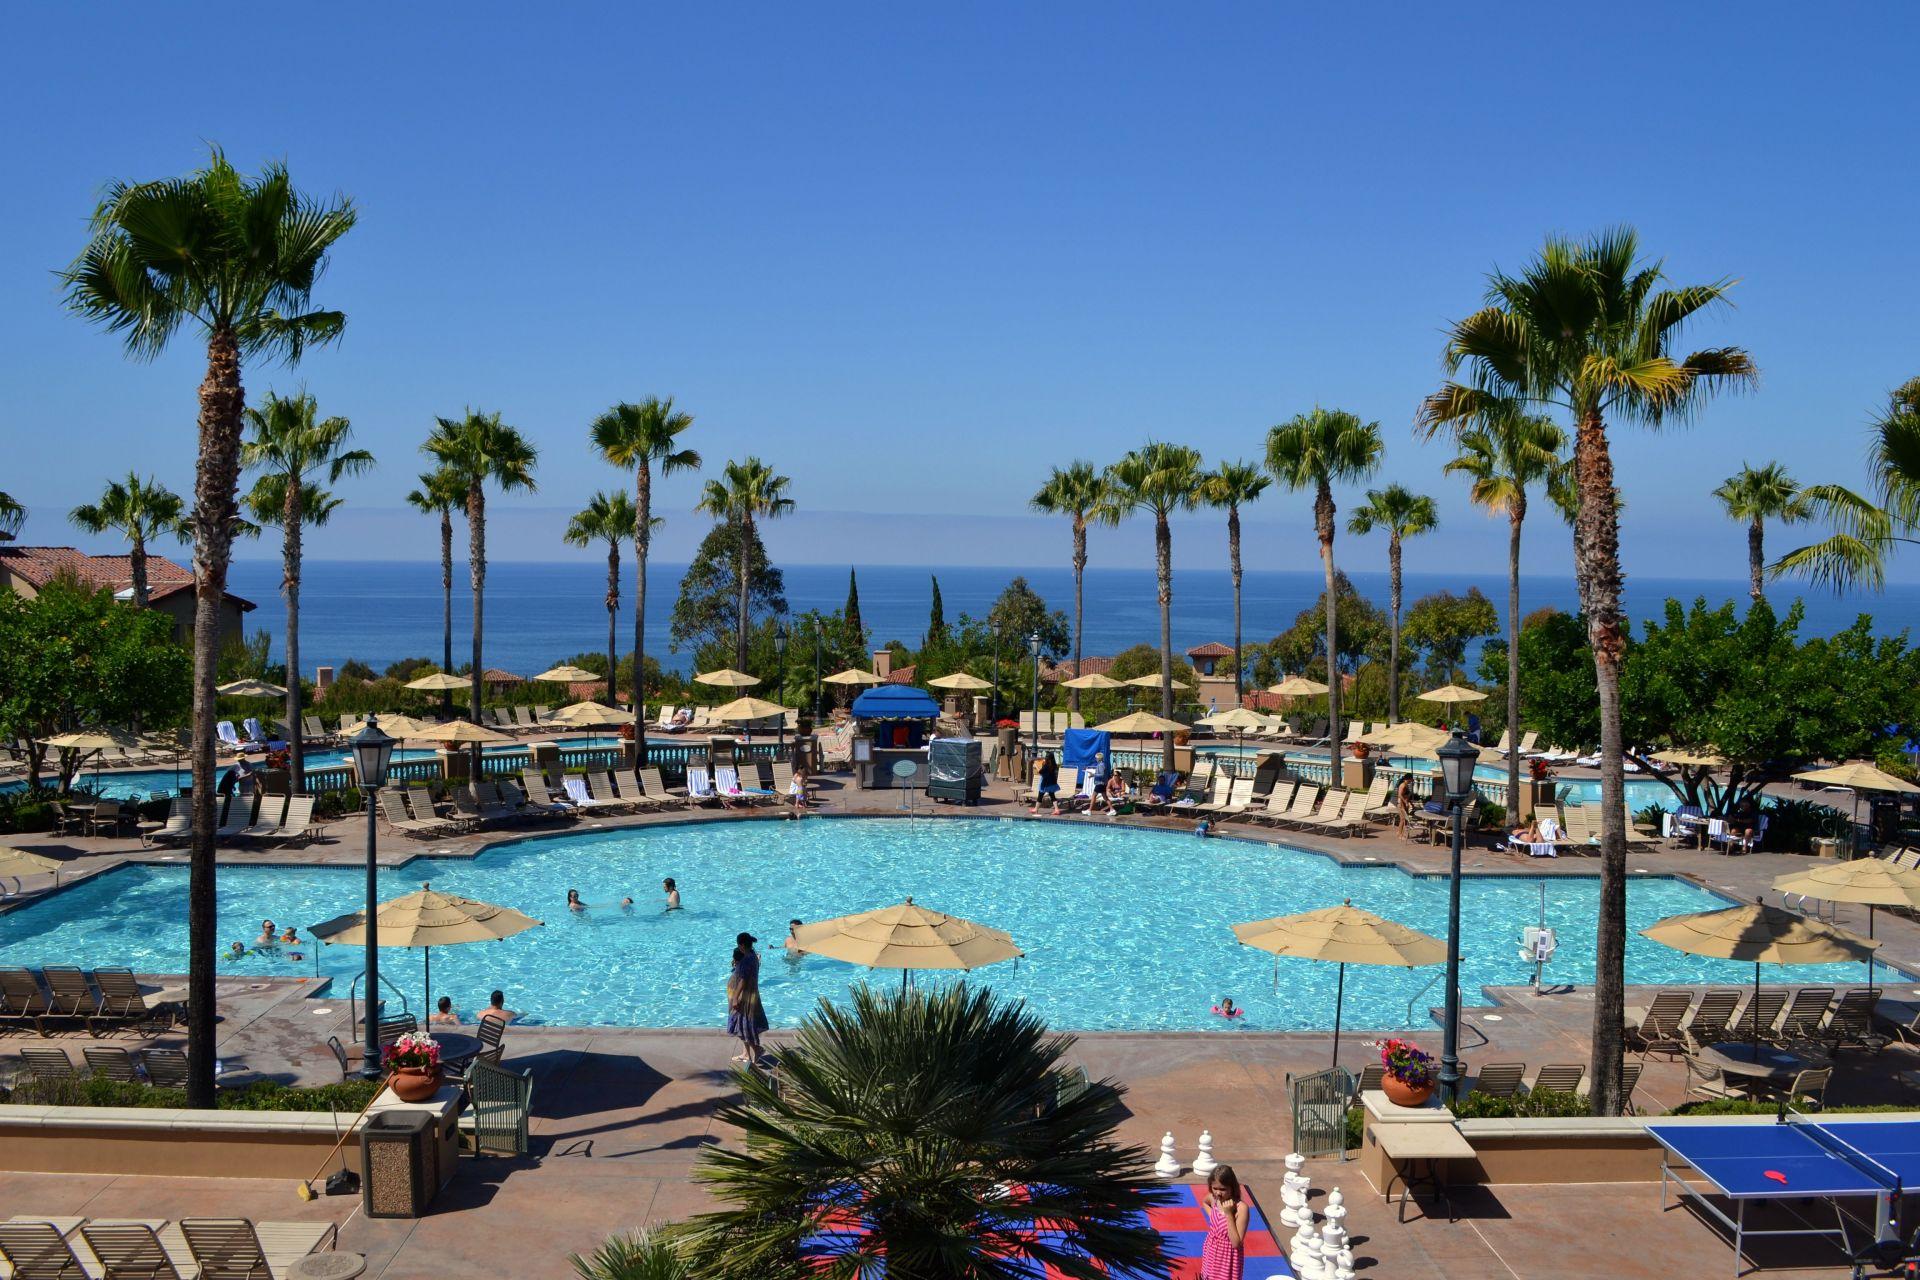 Beach Myrtle Carolina Resort Marriott South